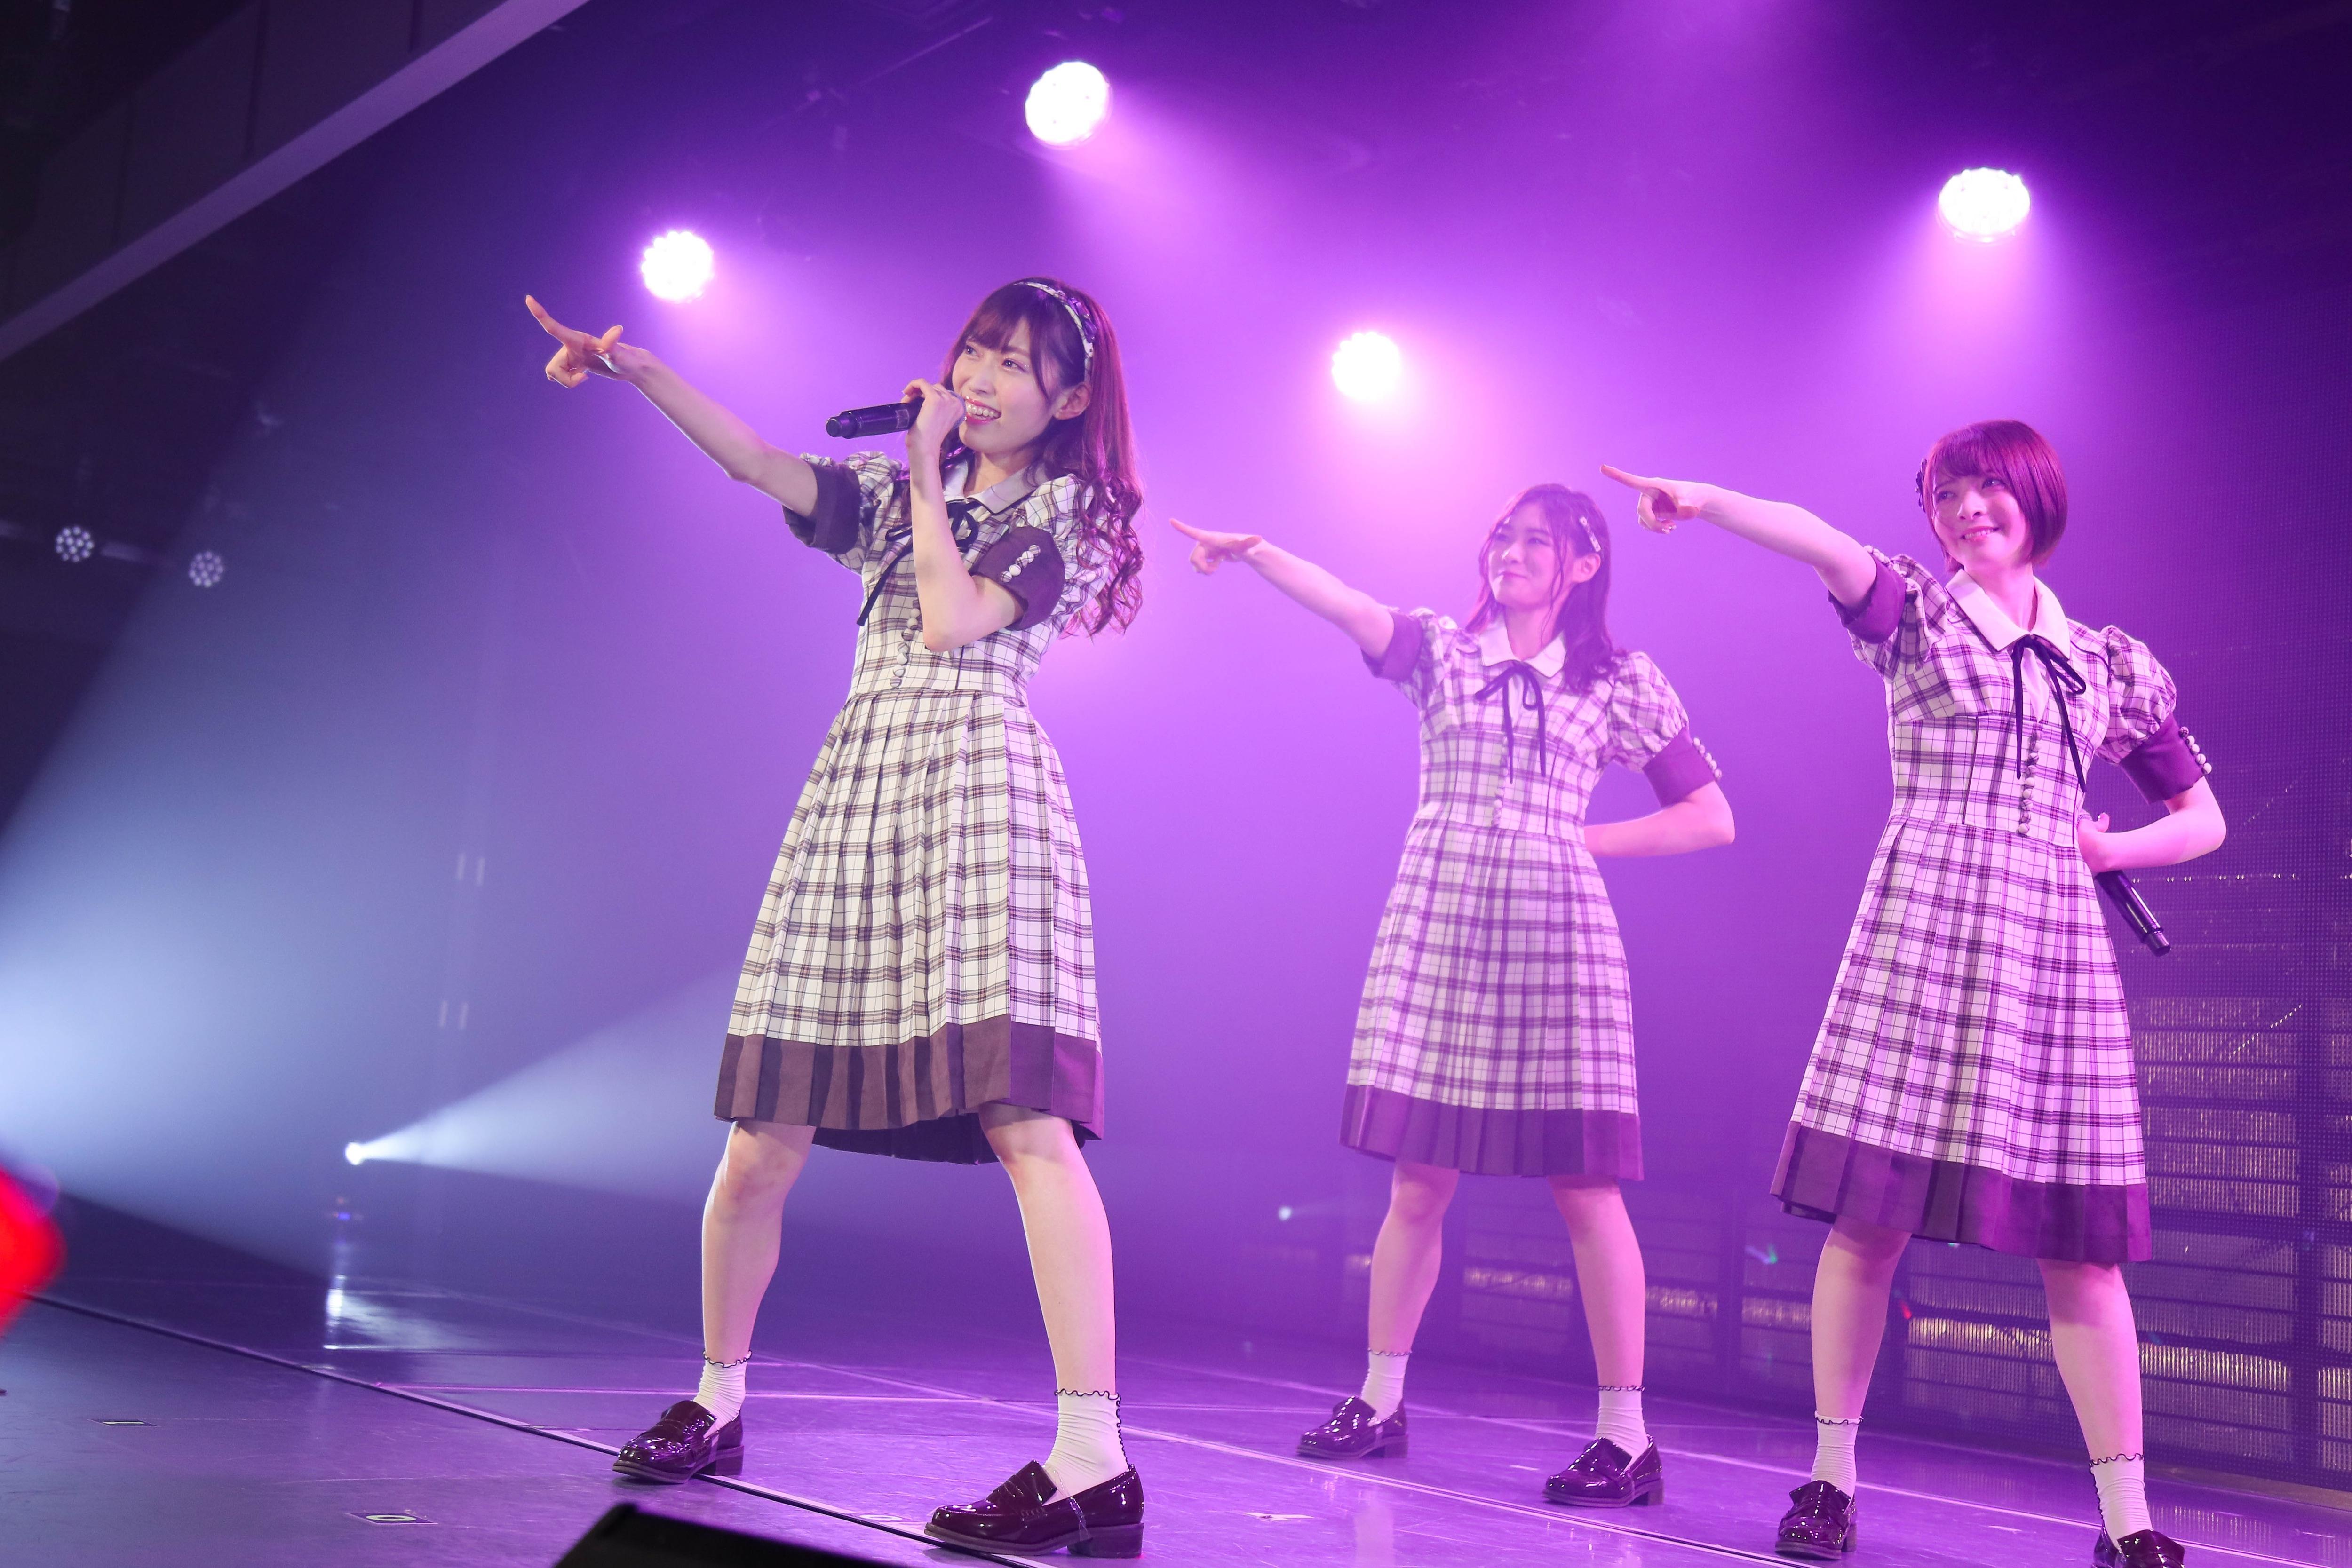 NGT48⼭⼝真帆、菅原りこ、⻑⾕川玲奈・卒業公演後のコメント発表!【写真14枚】の画像001